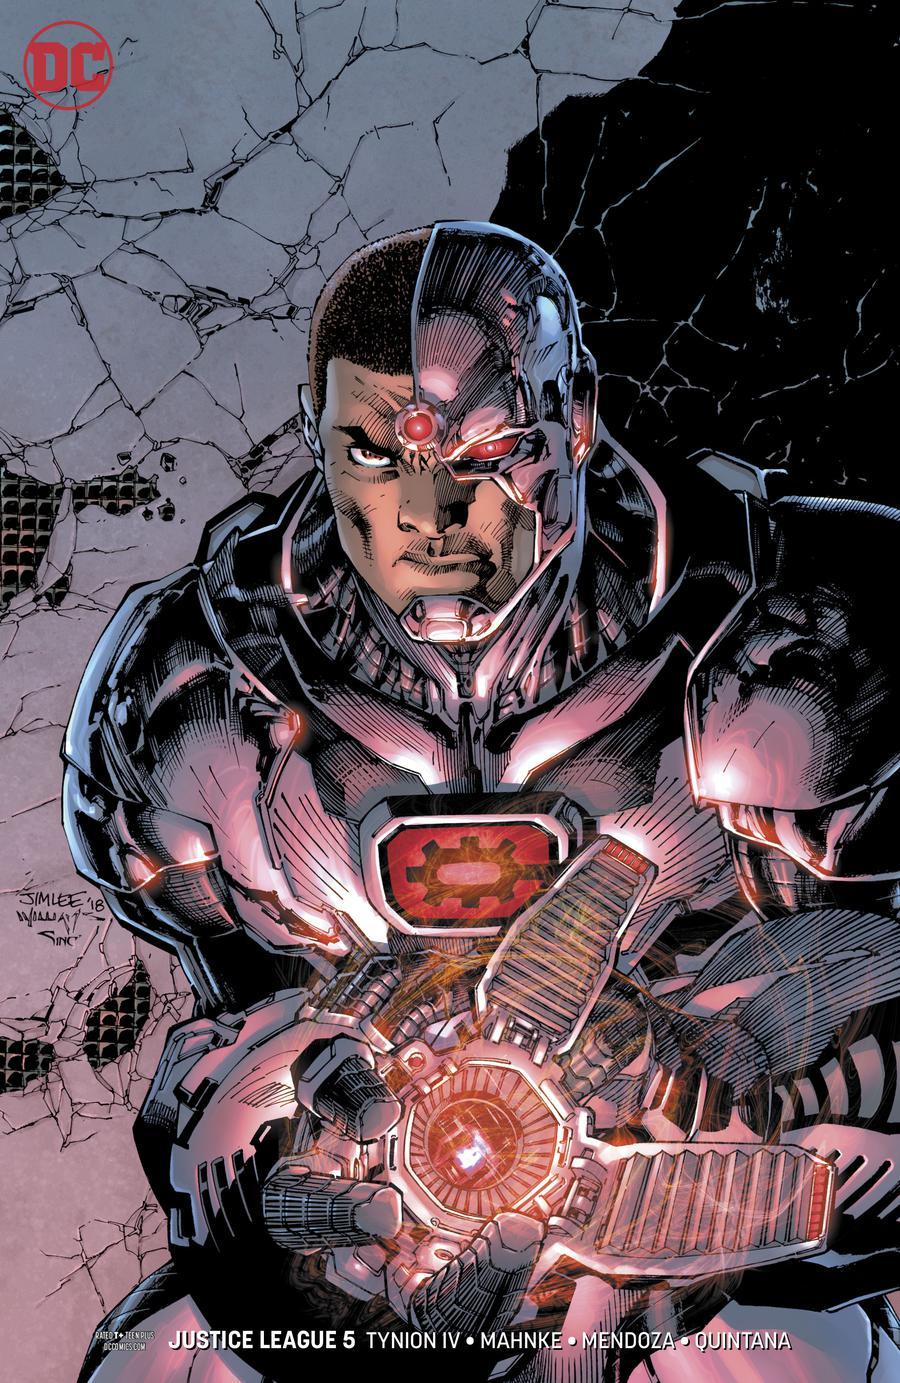 Justice League Vol 4 #5 Cover B Variant Jim Lee & Scott Williams Cover